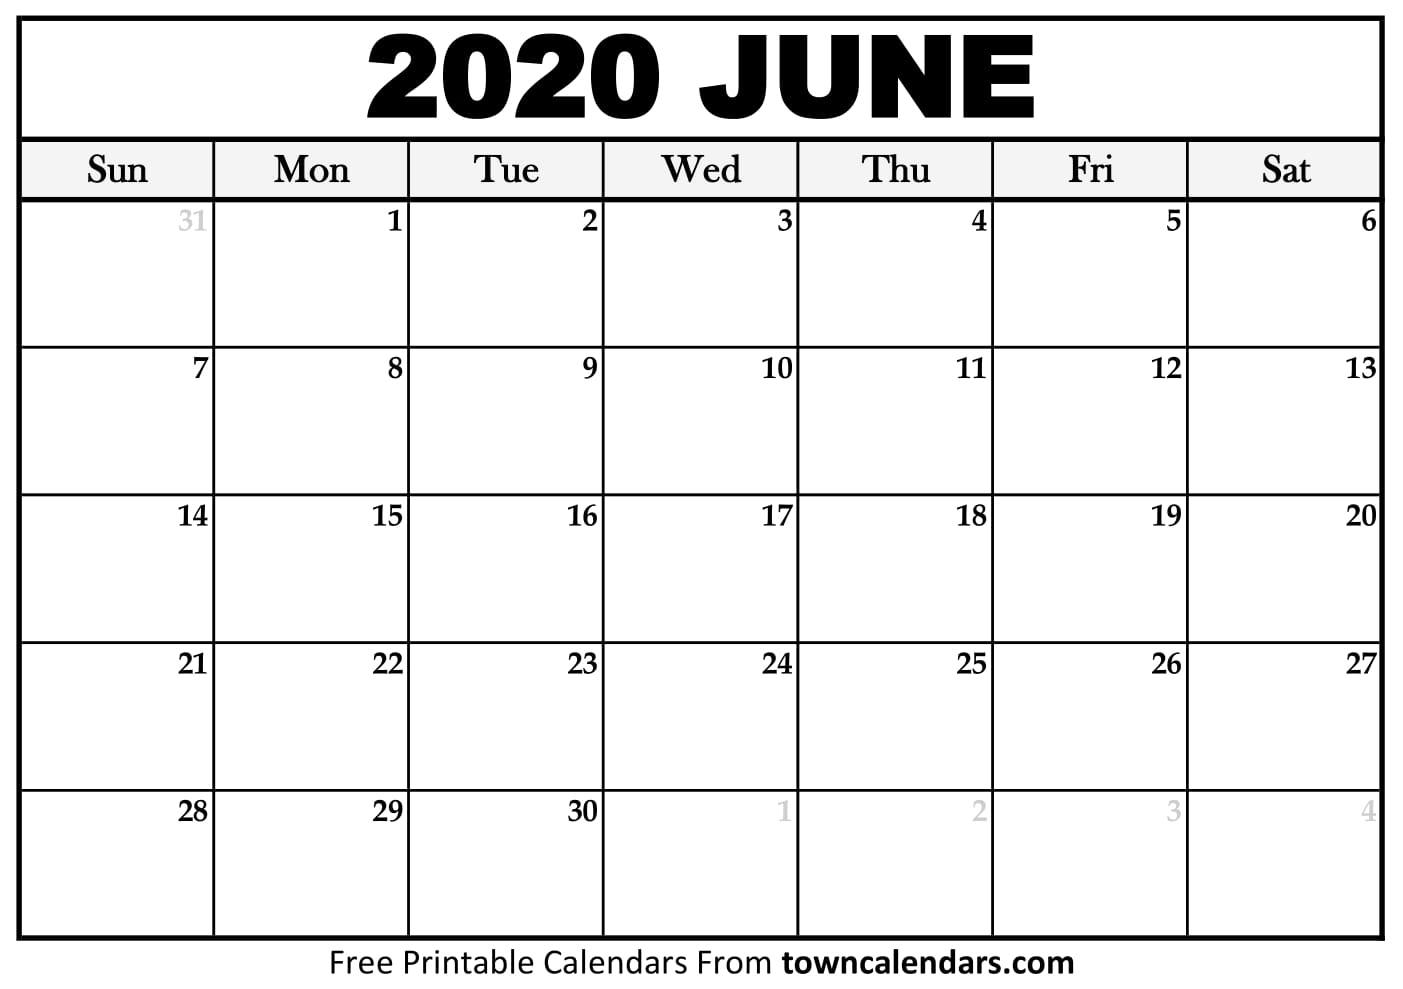 Printable June 2020 Calendar - Towncalendars